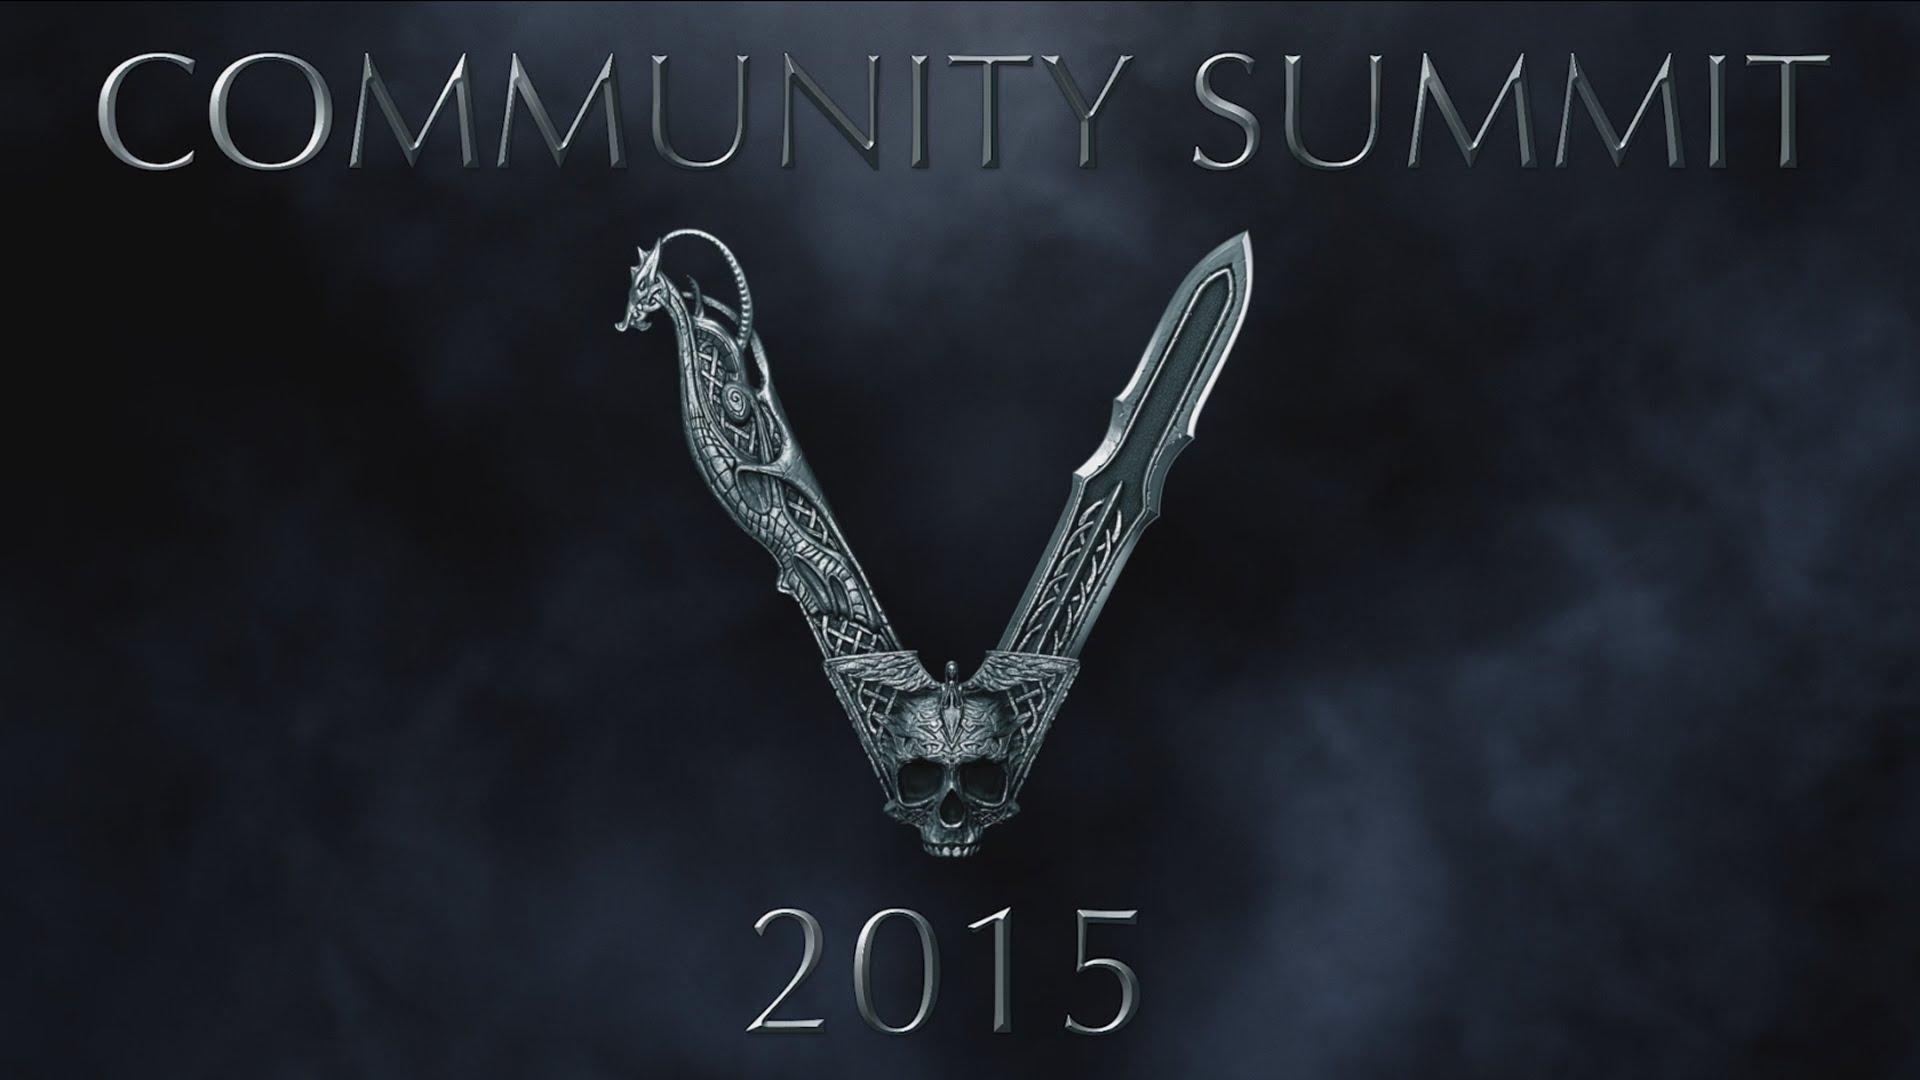 Vindictus Community Summit 2015 video thumbnail